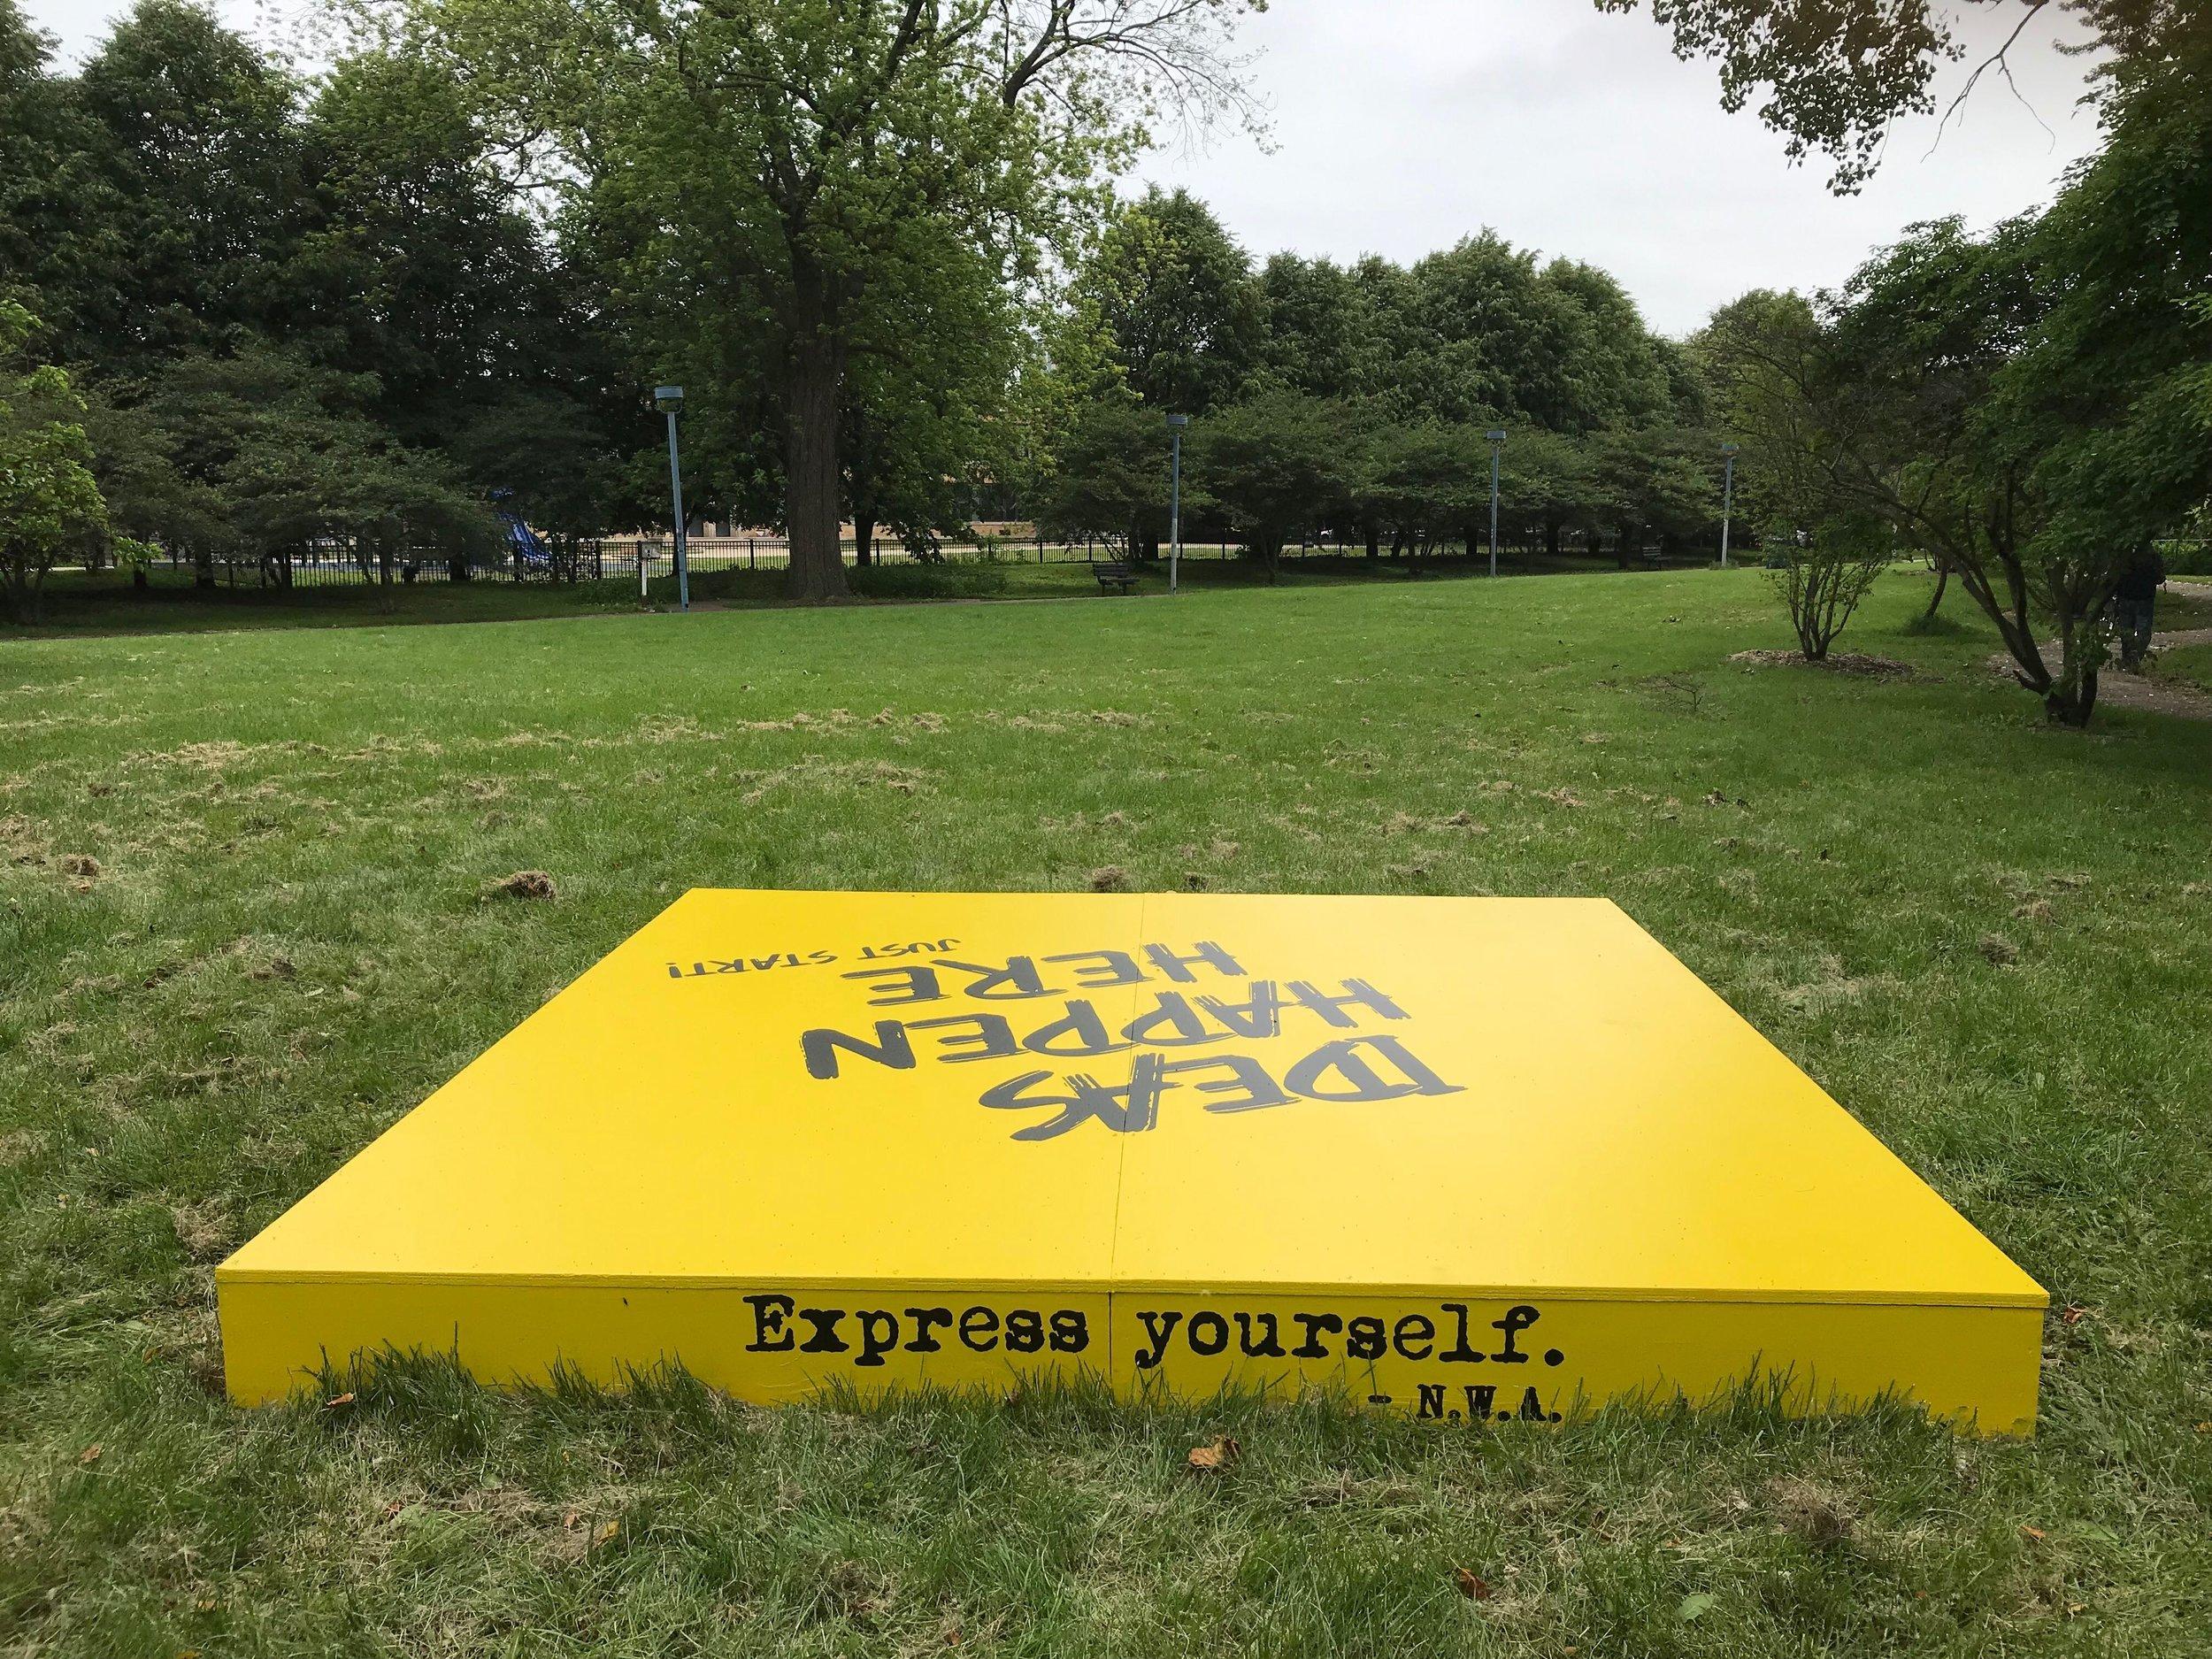 Nichols Park: (1404 E. 53rd St., Chicago, IL 60615)